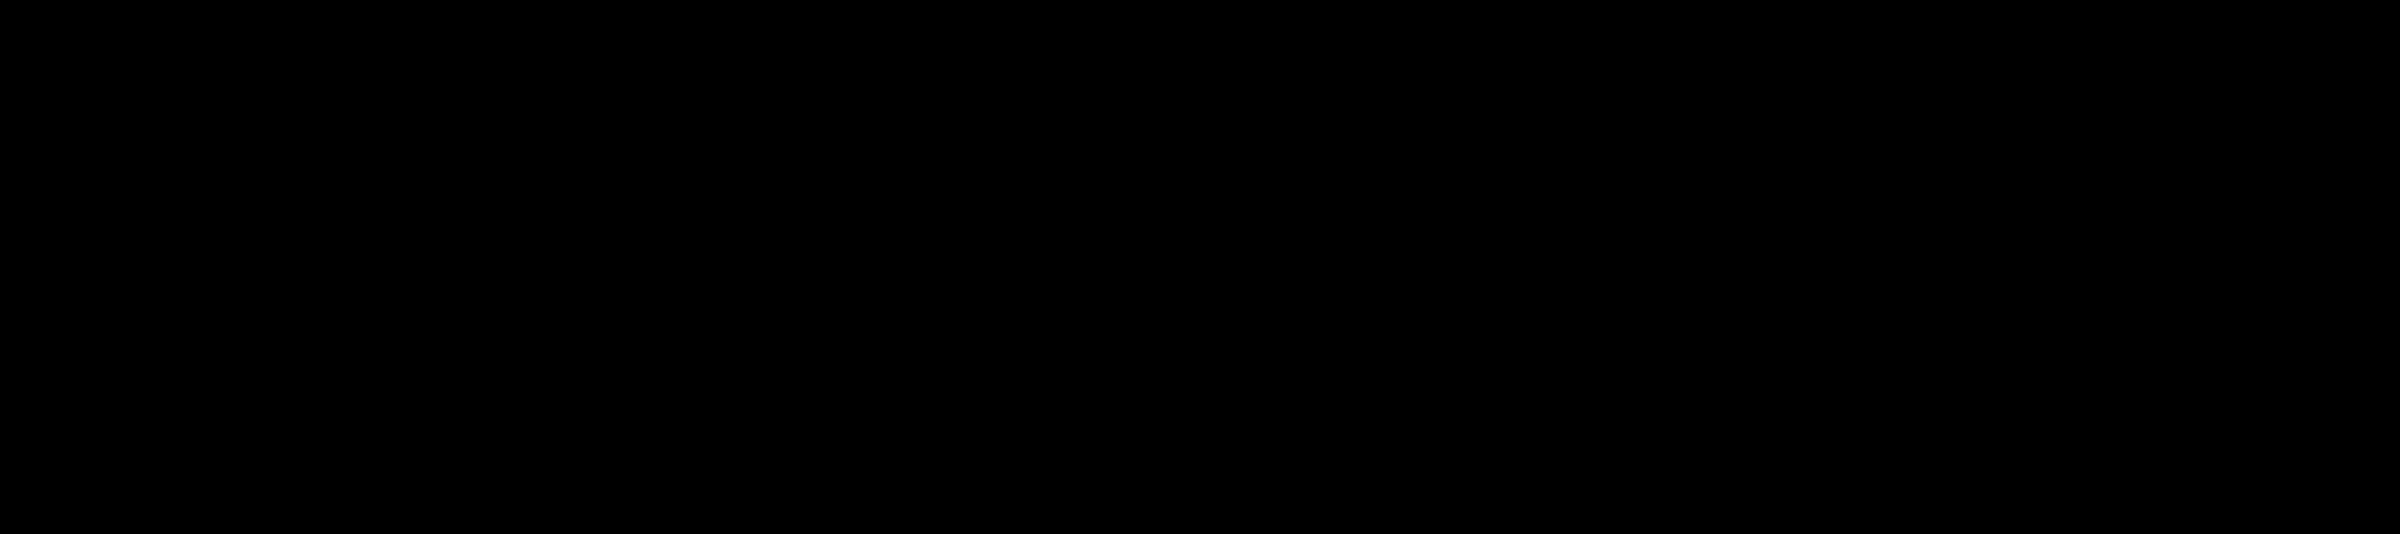 2400x534 Clipart